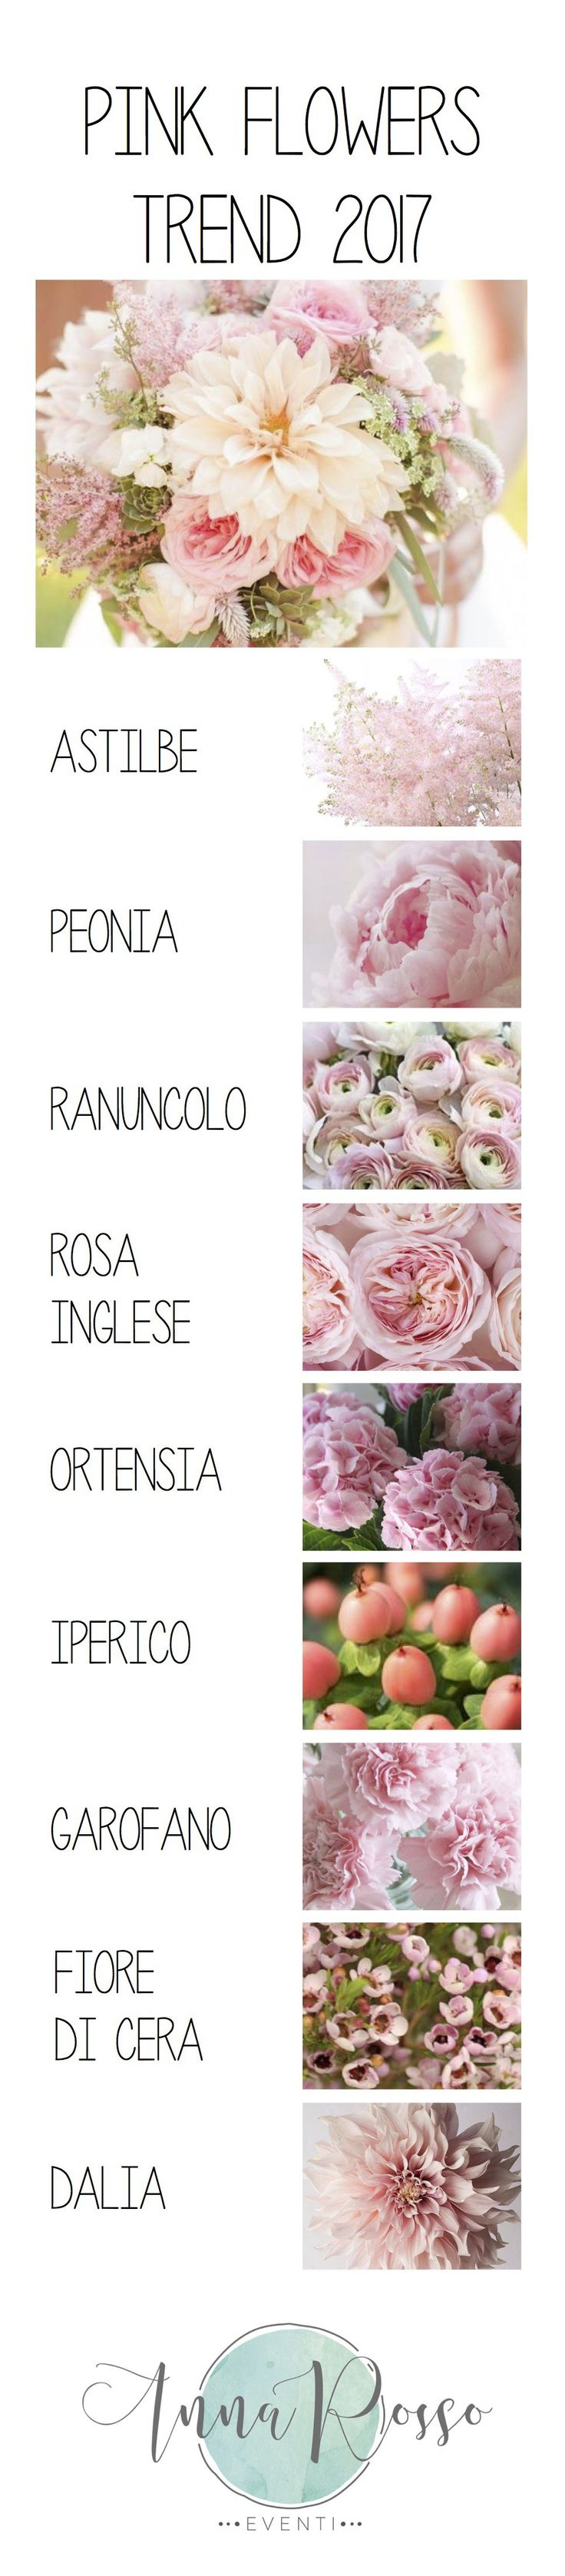 Flower trend 2017 – Pink– Anna Rosso Eventi